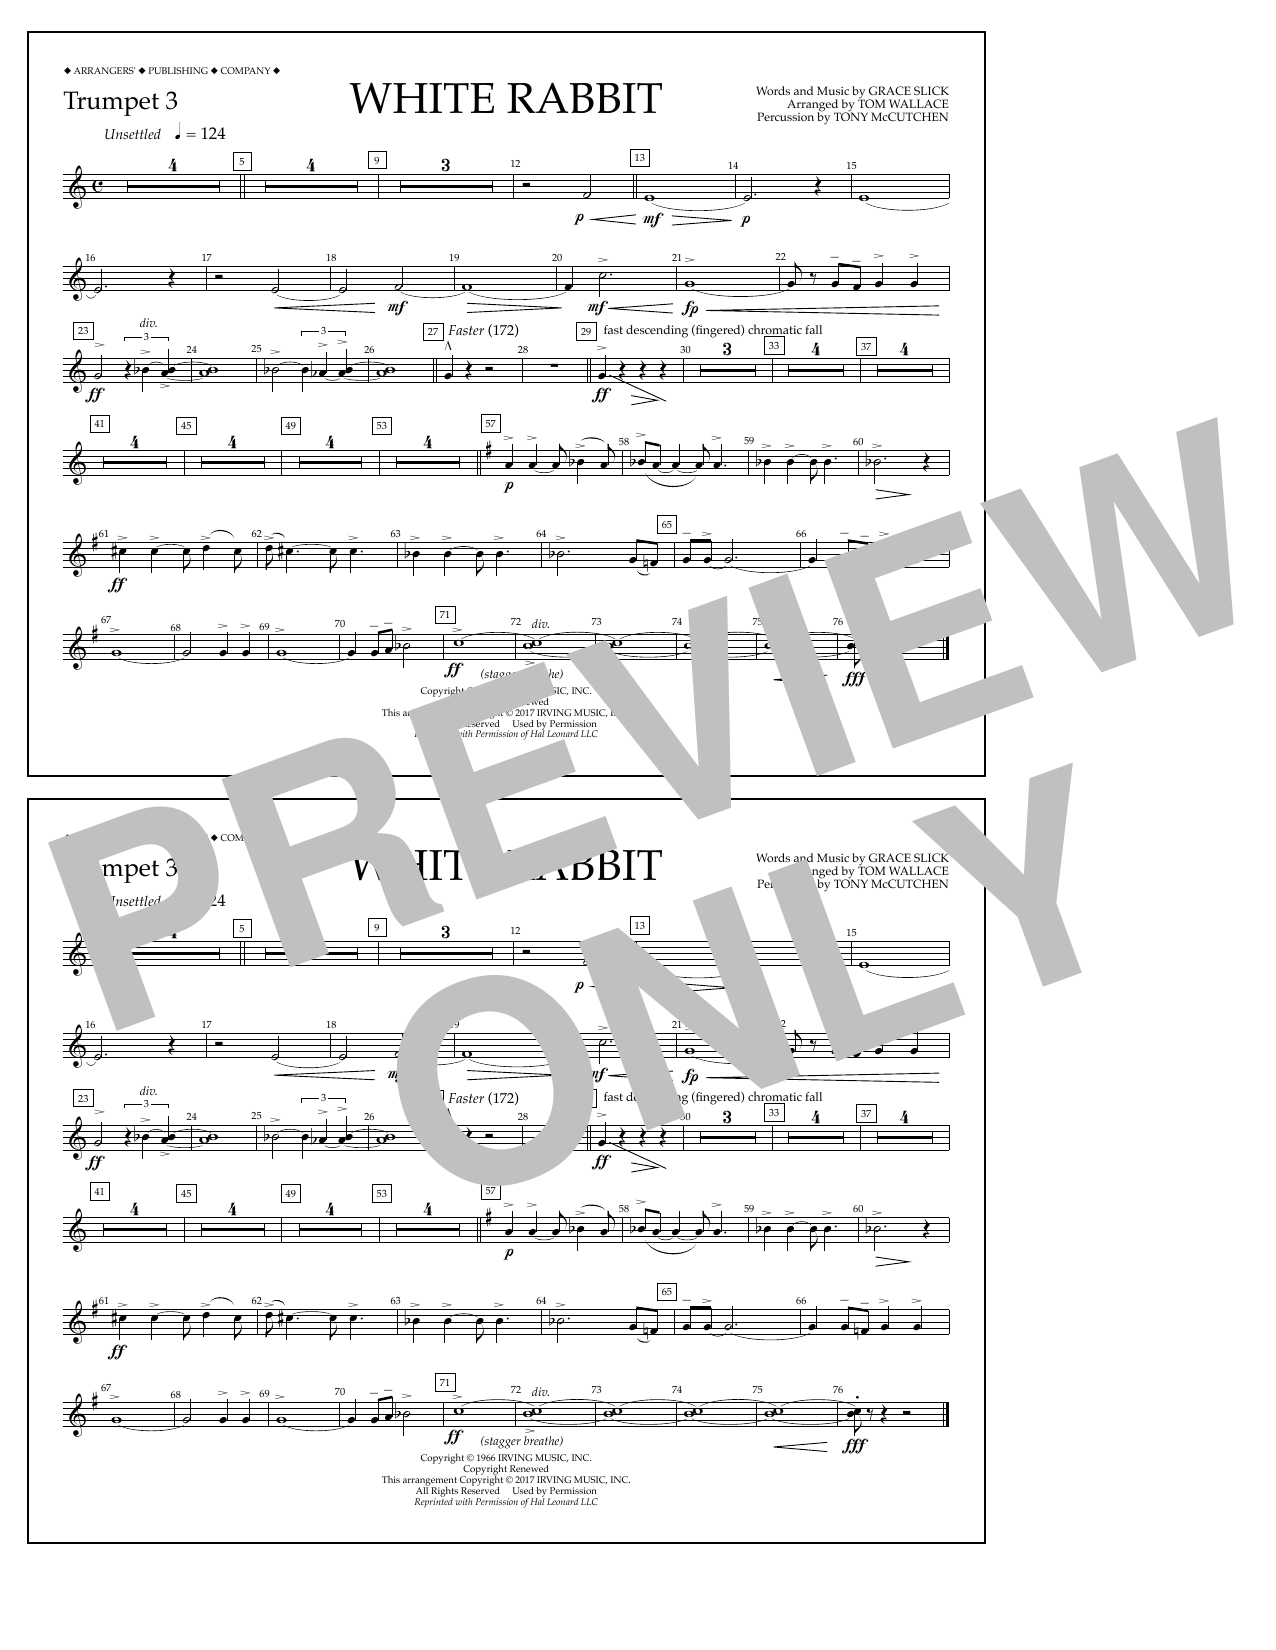 White Rabbit - Trumpet 3 Sheet Music